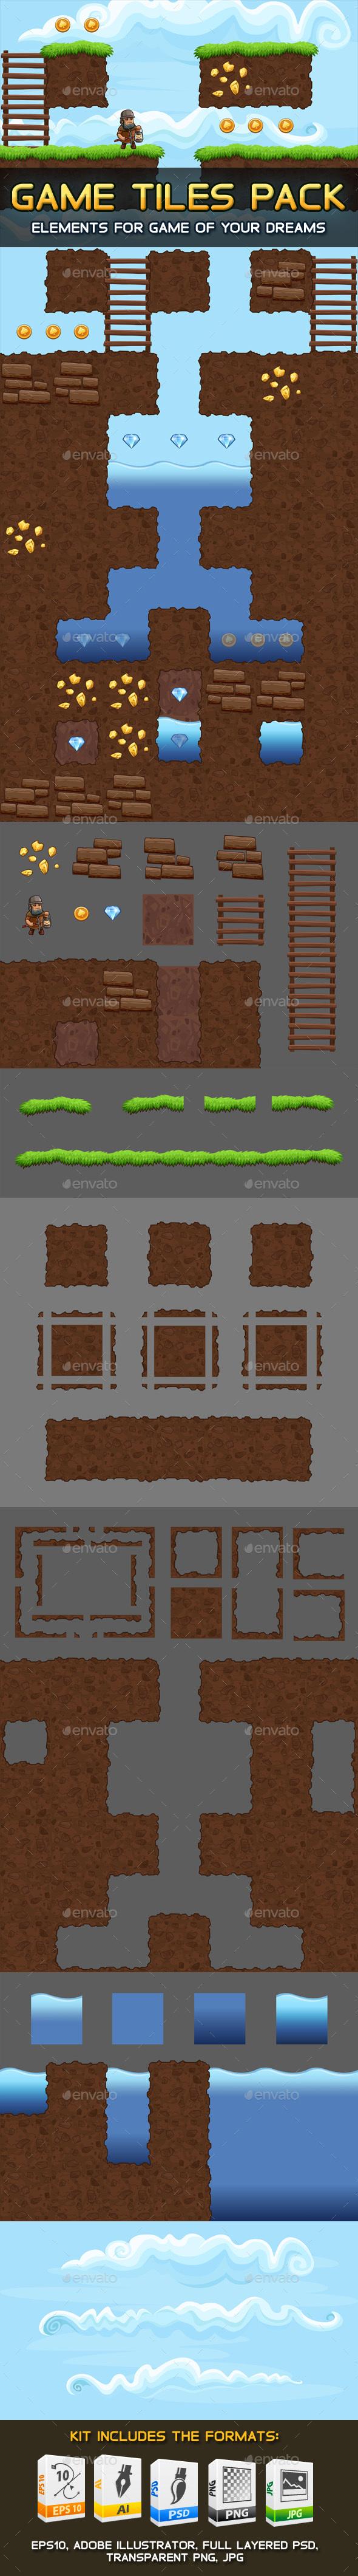 Game Tiles Pack - Tilesets Game Assets